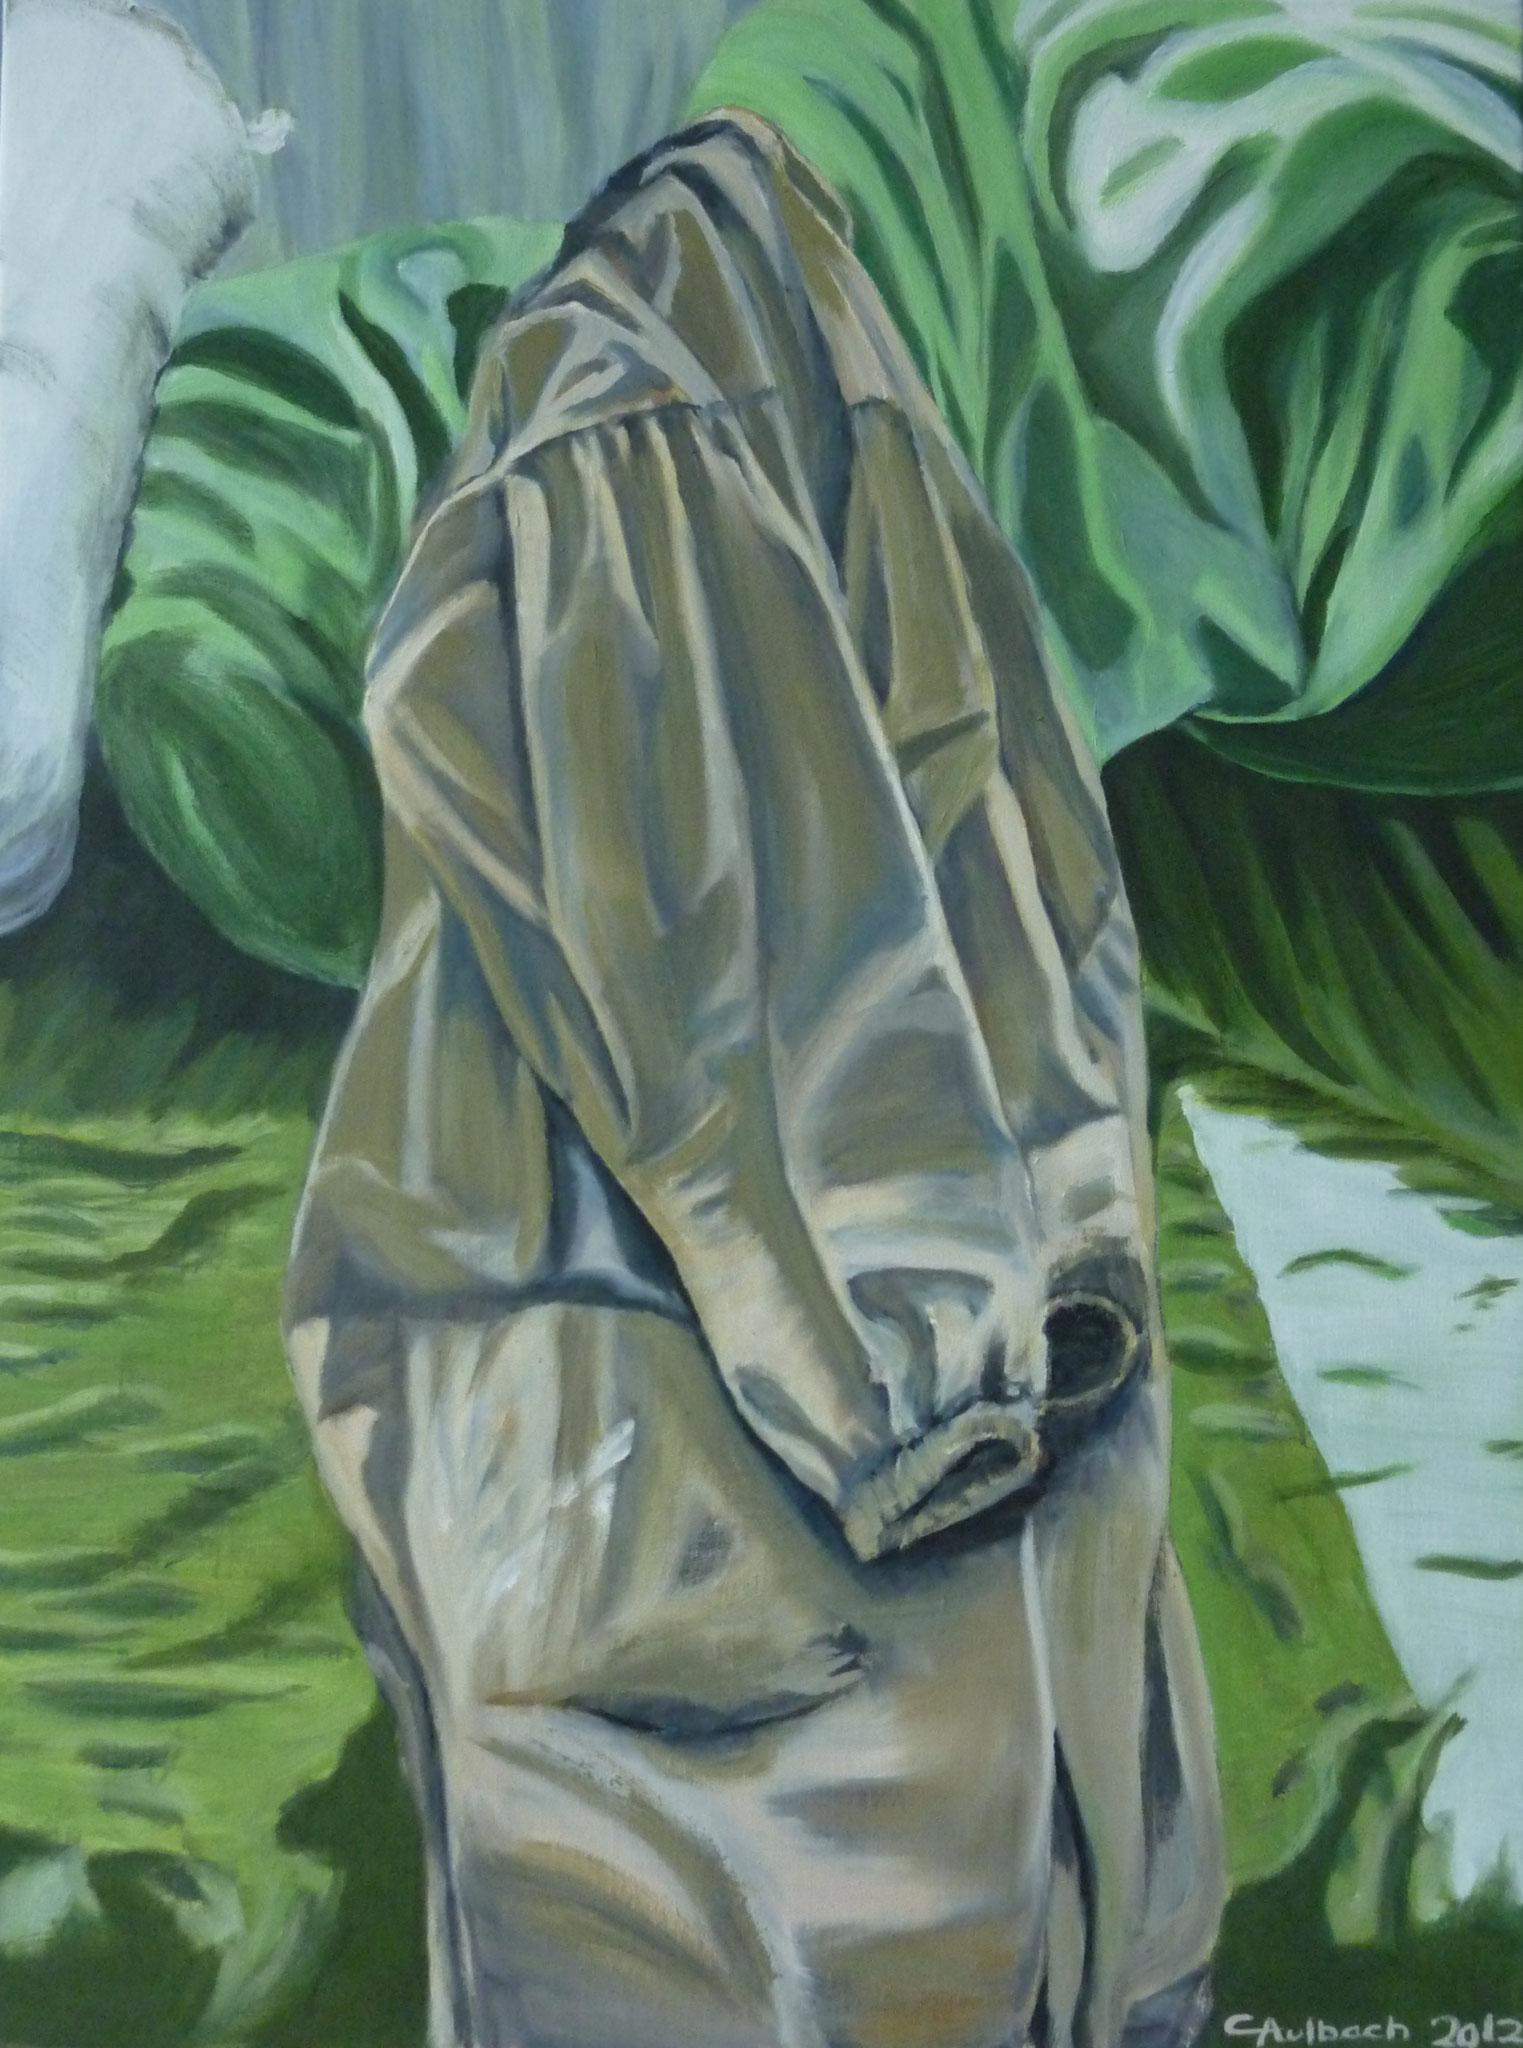 artist's rest, 2012, 100 x 70cm, Öl auf Leinwand